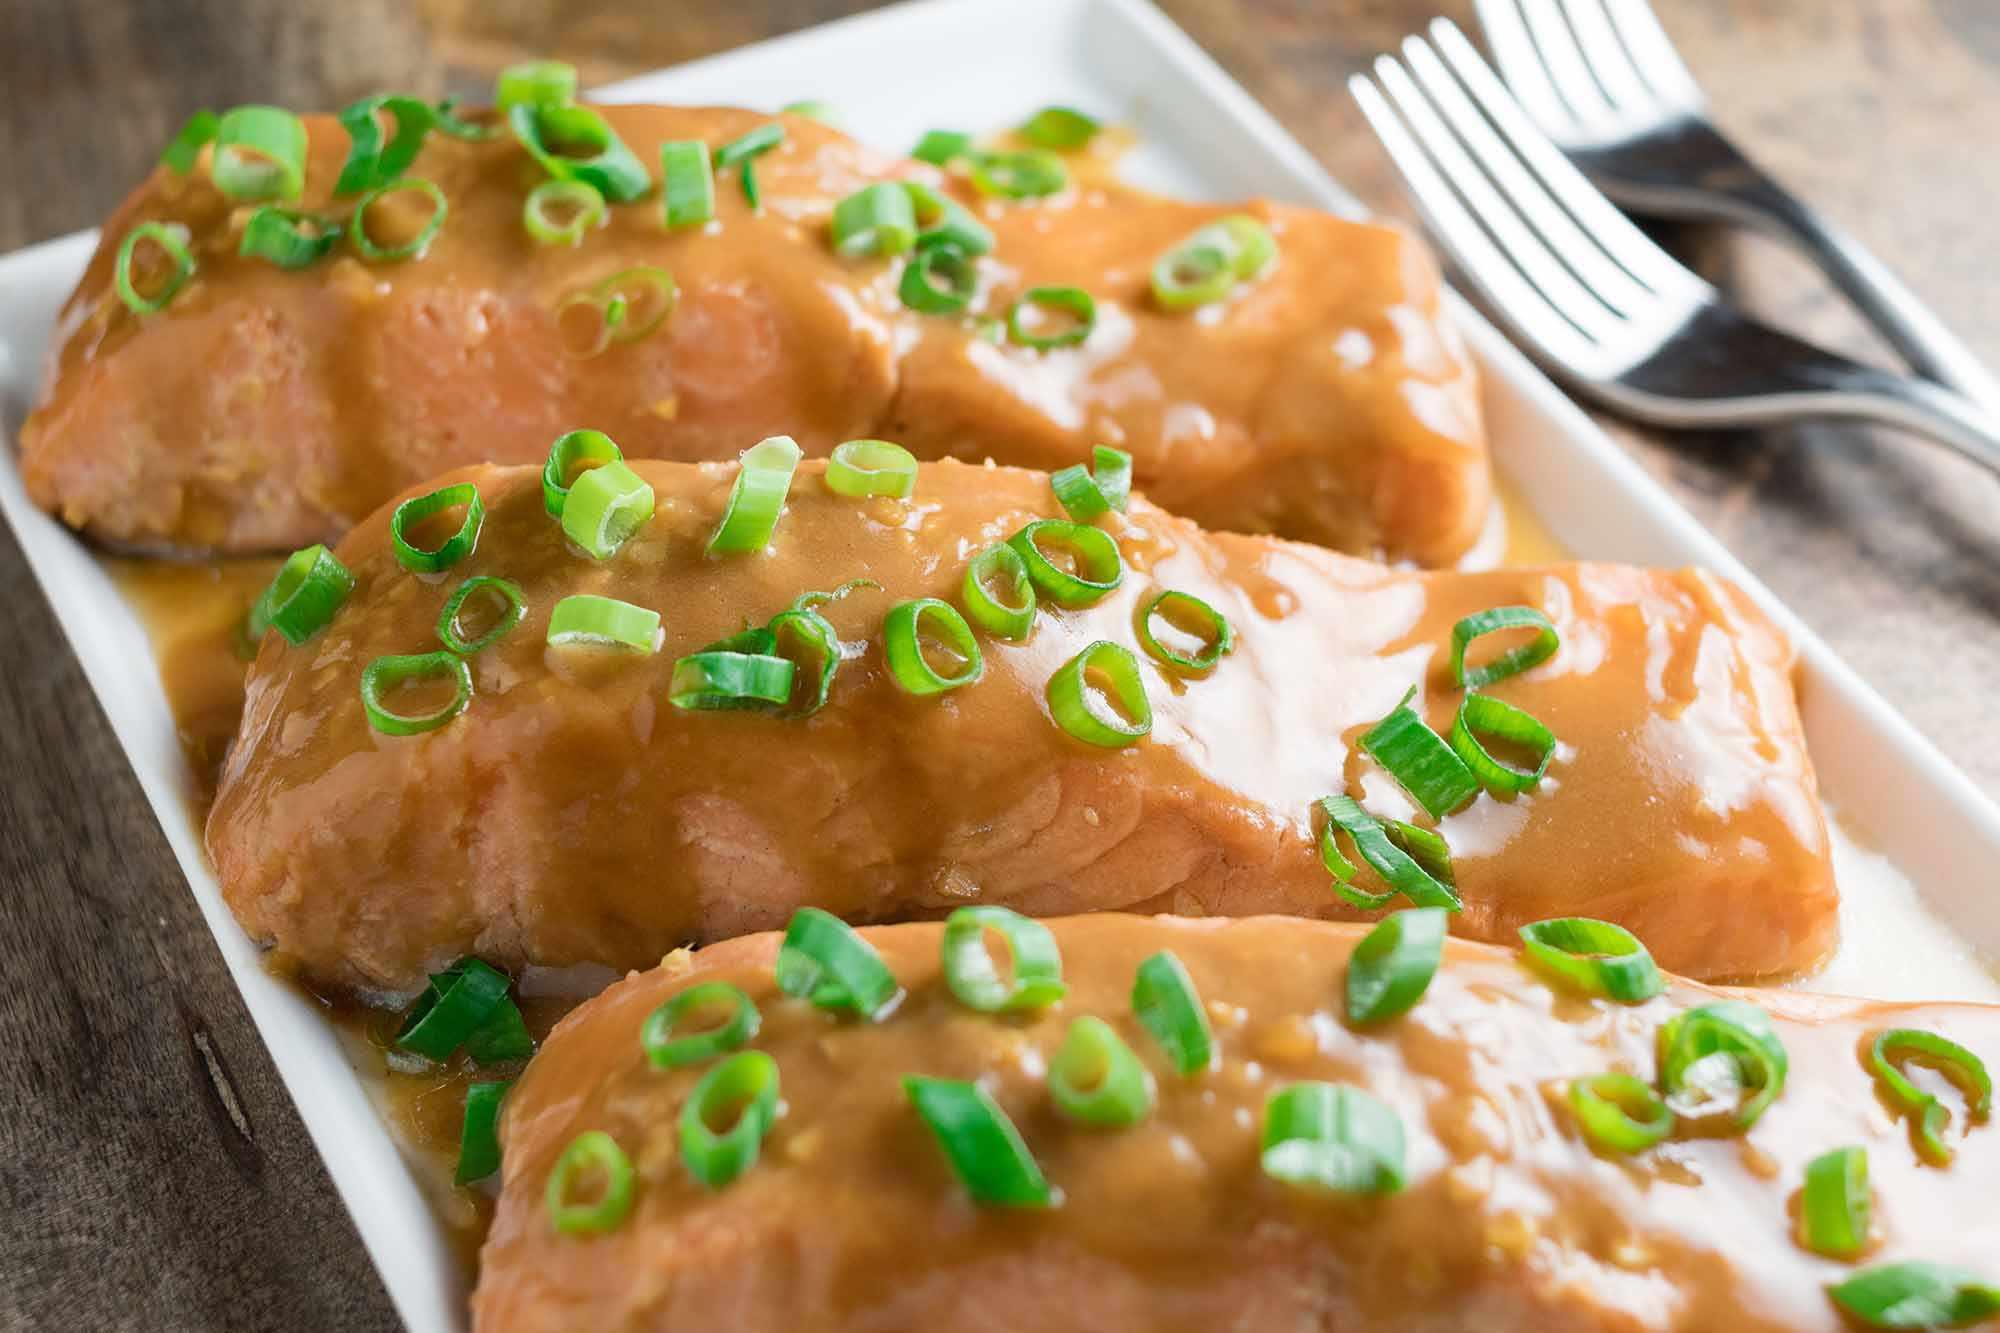 Teriyaki Salmon cooked sous vide on a platter